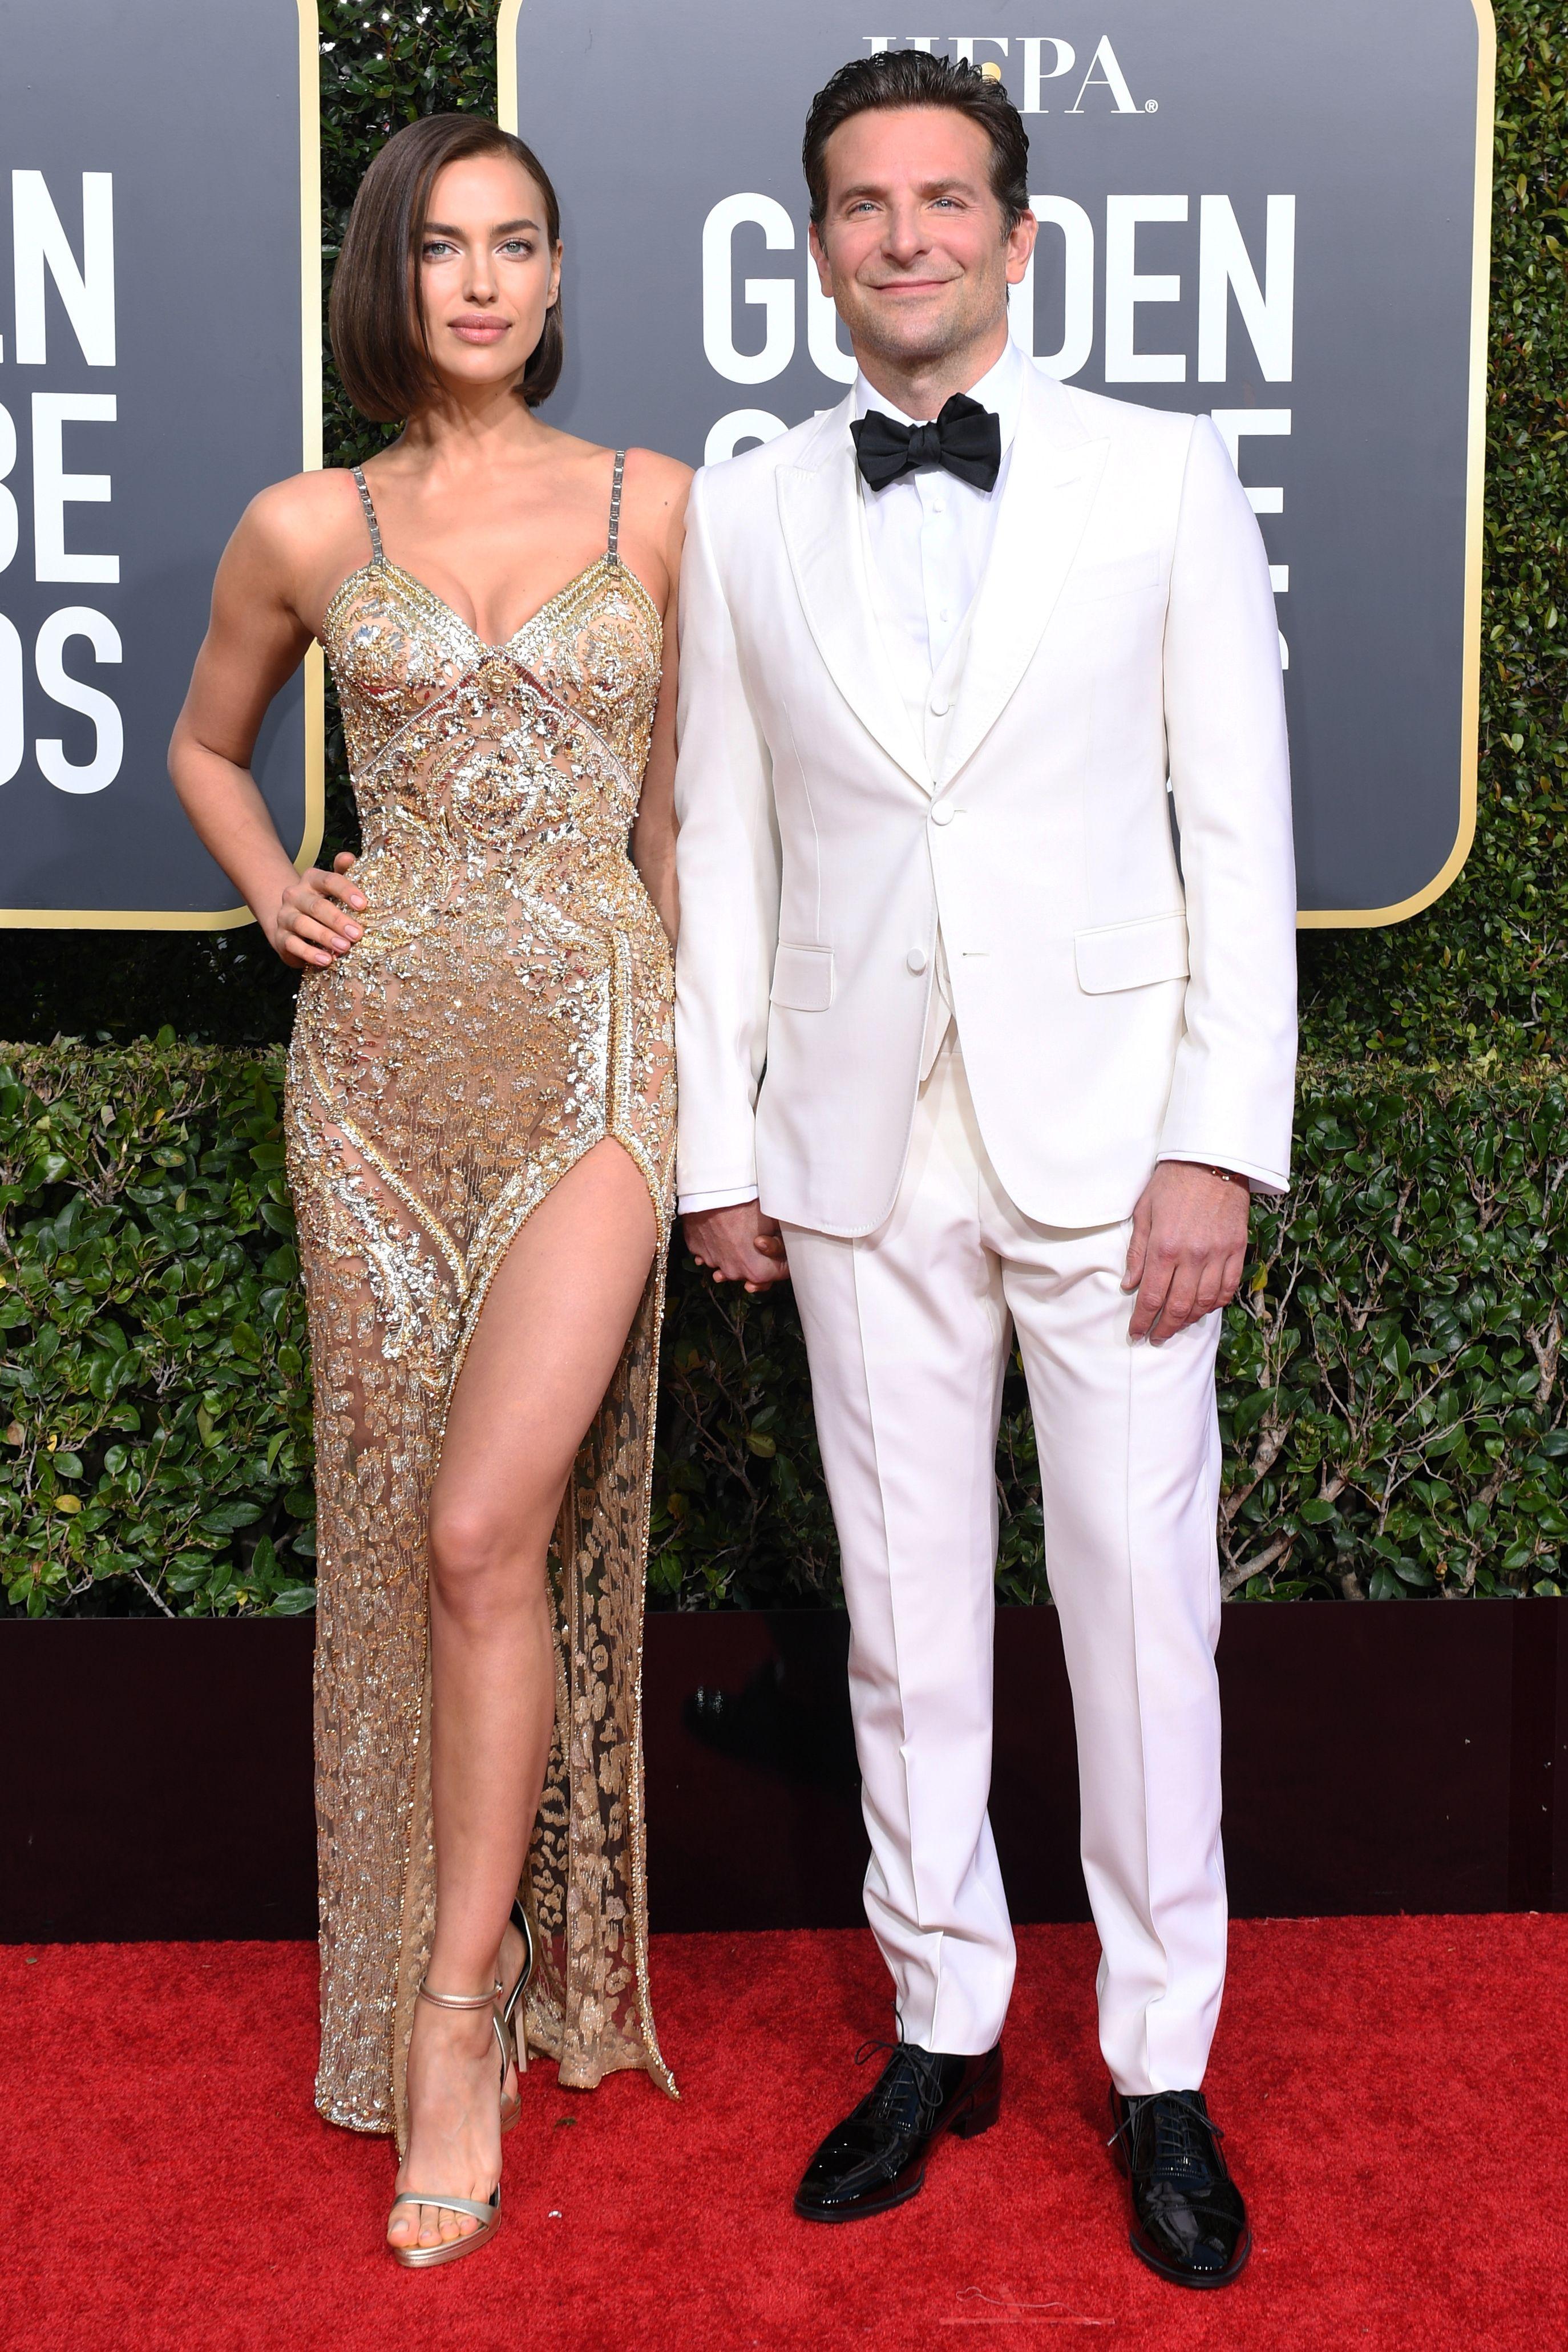 Irina Shayk talks breakup with Bradley Cooper